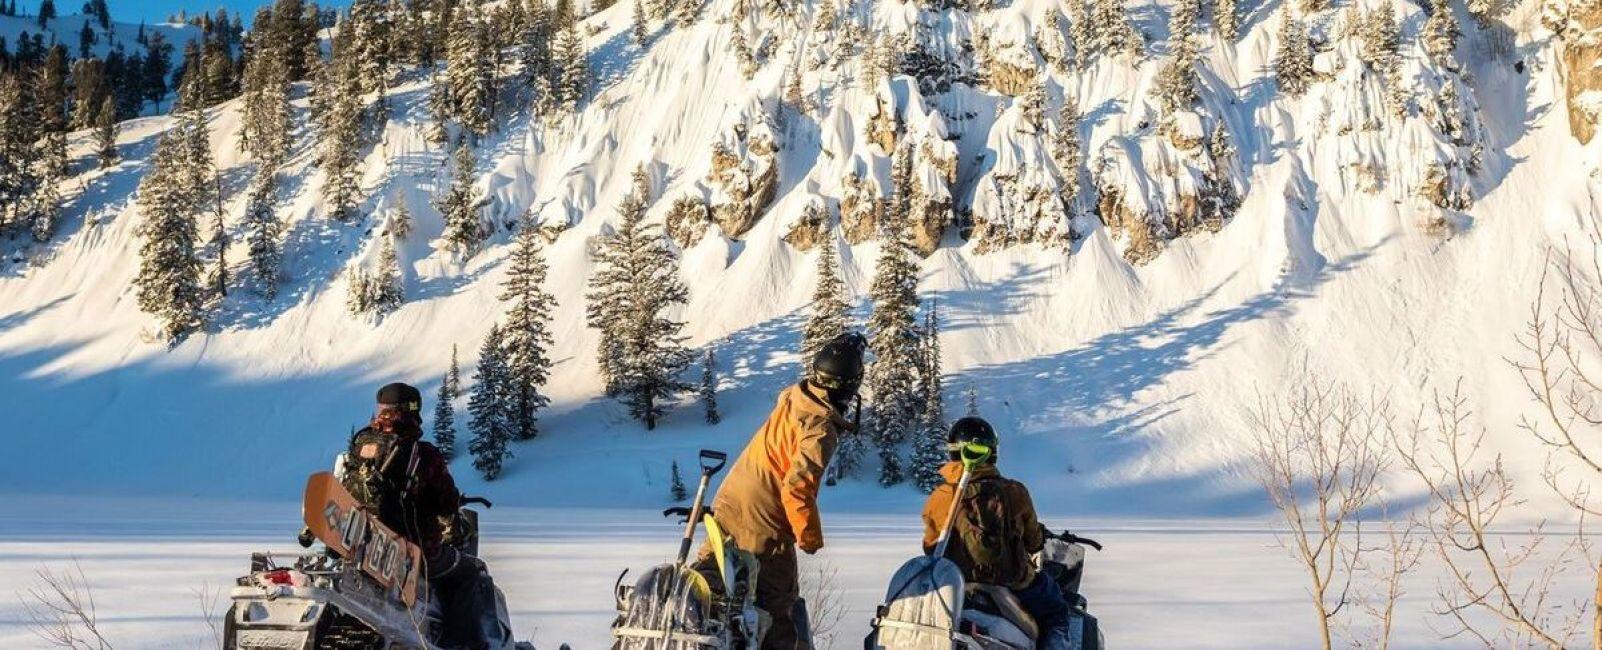 Powder People: Snowboard Photographers